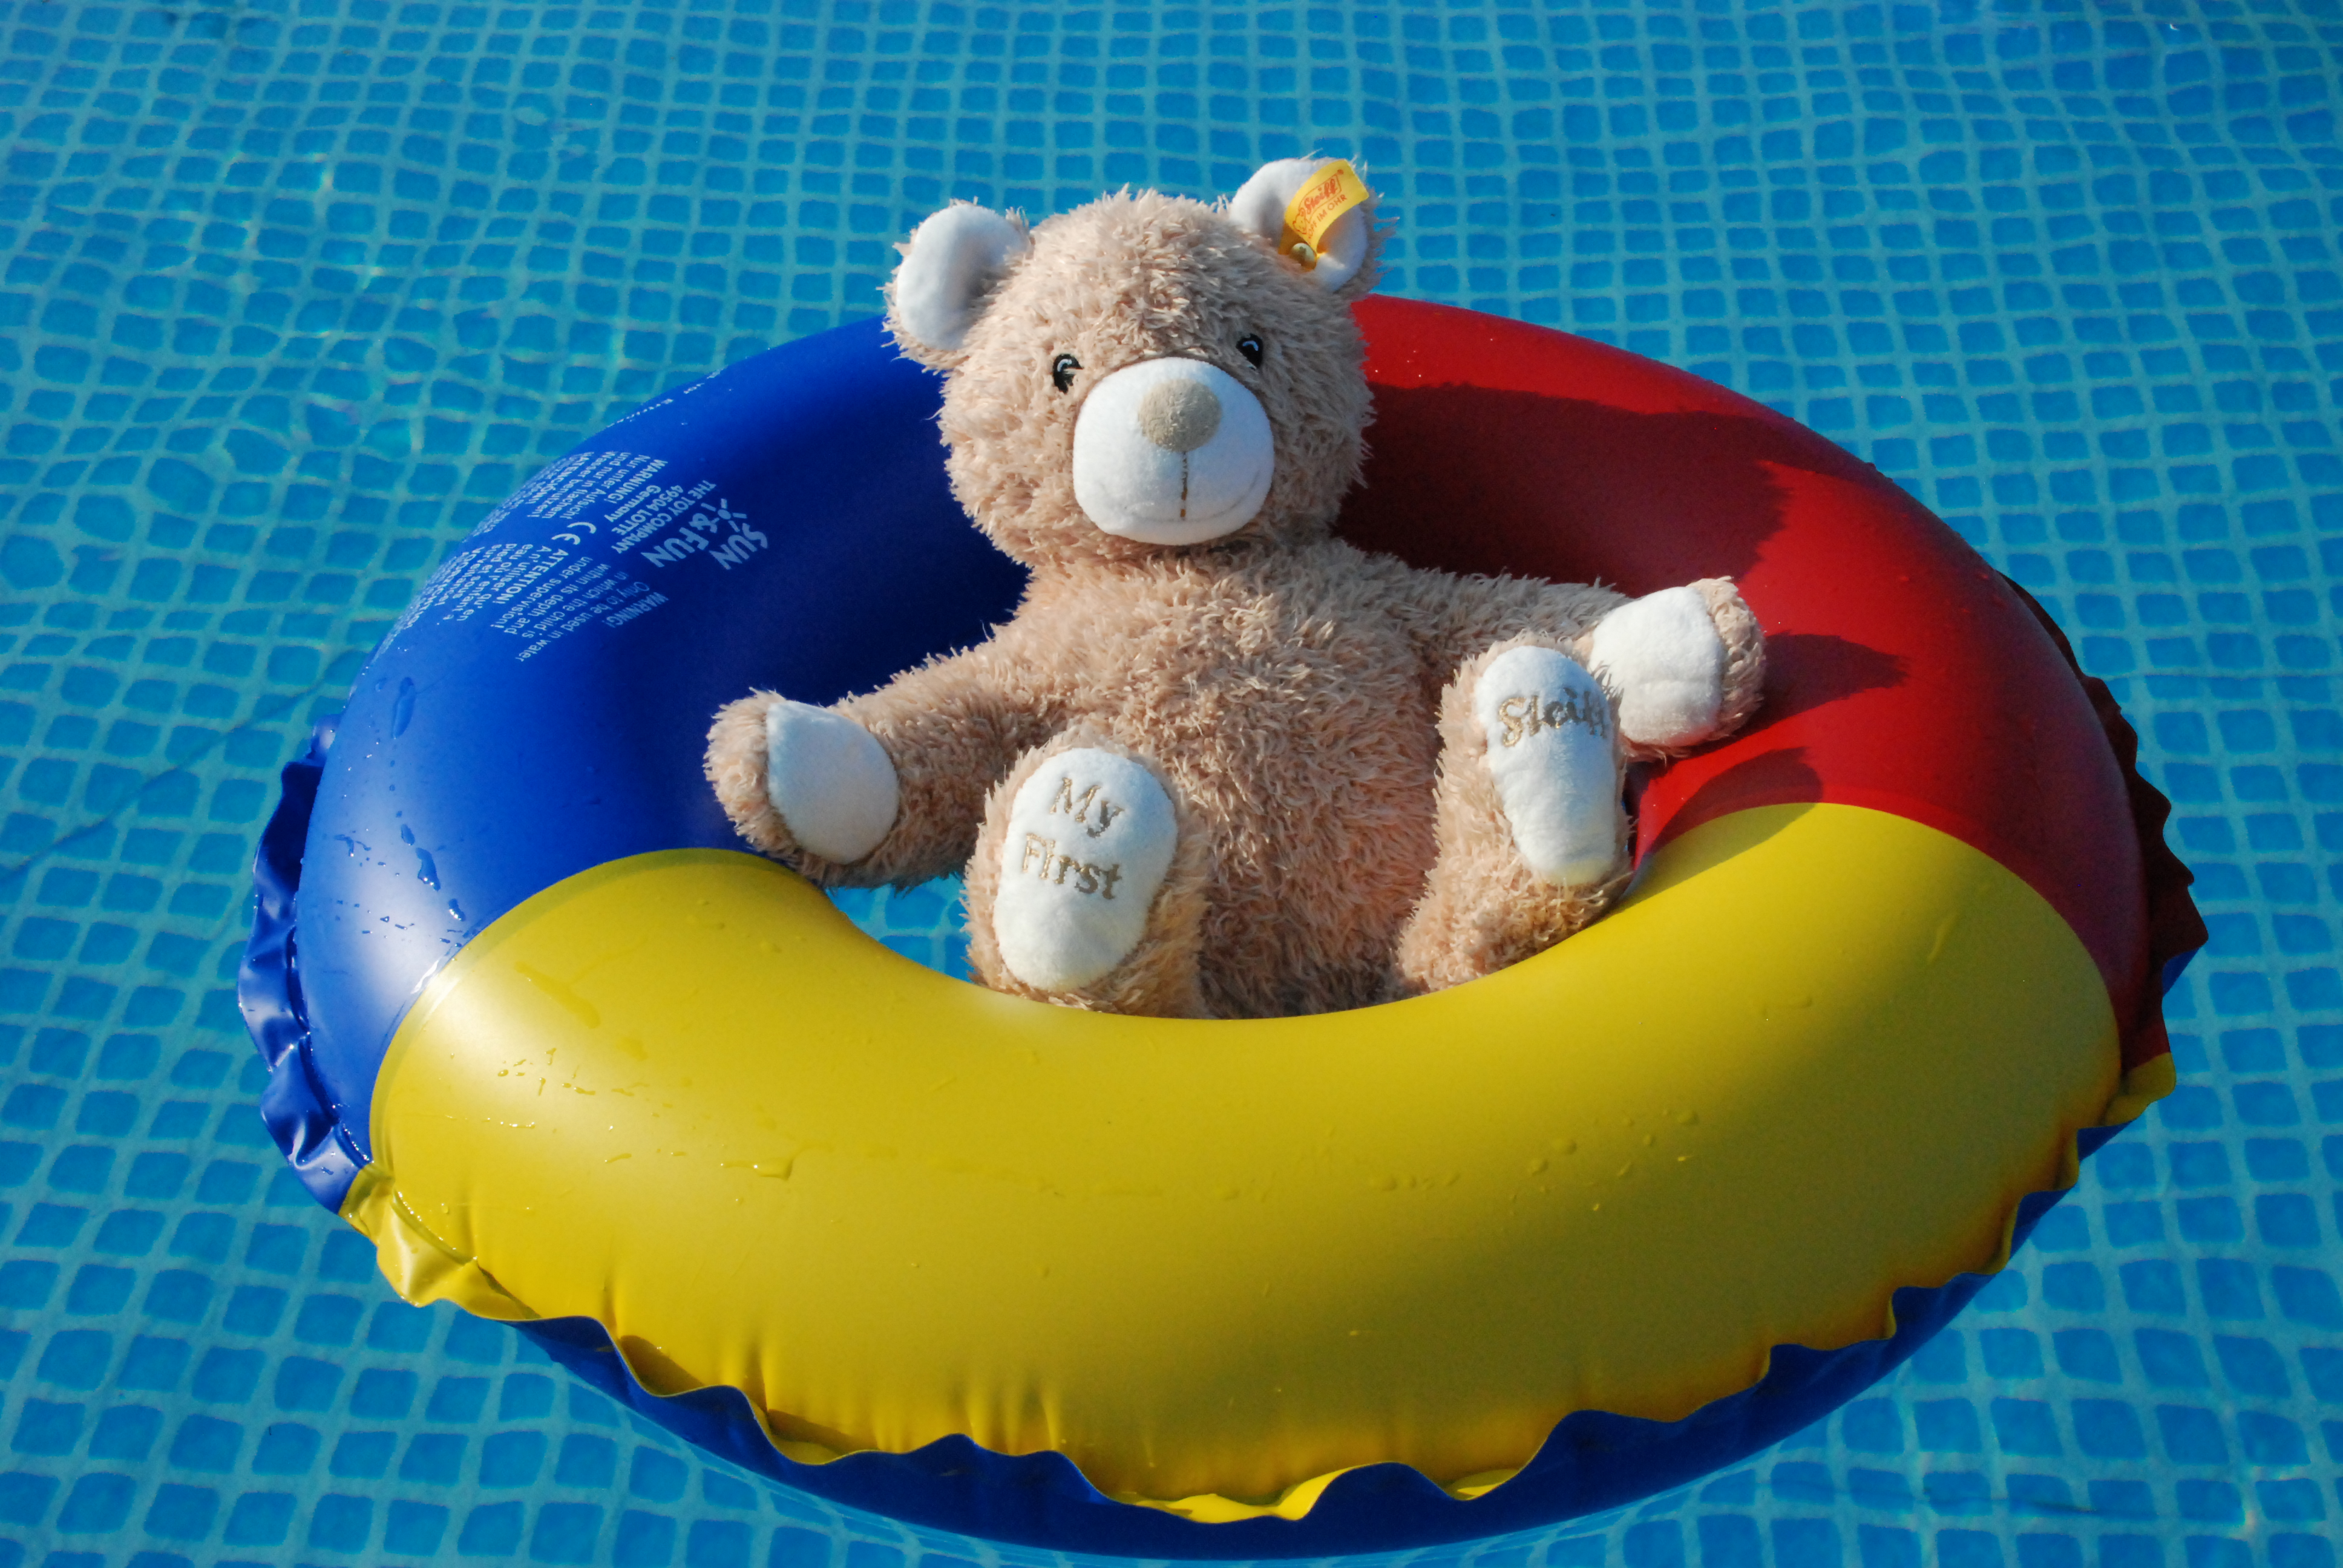 Swim ring - Wikipedia